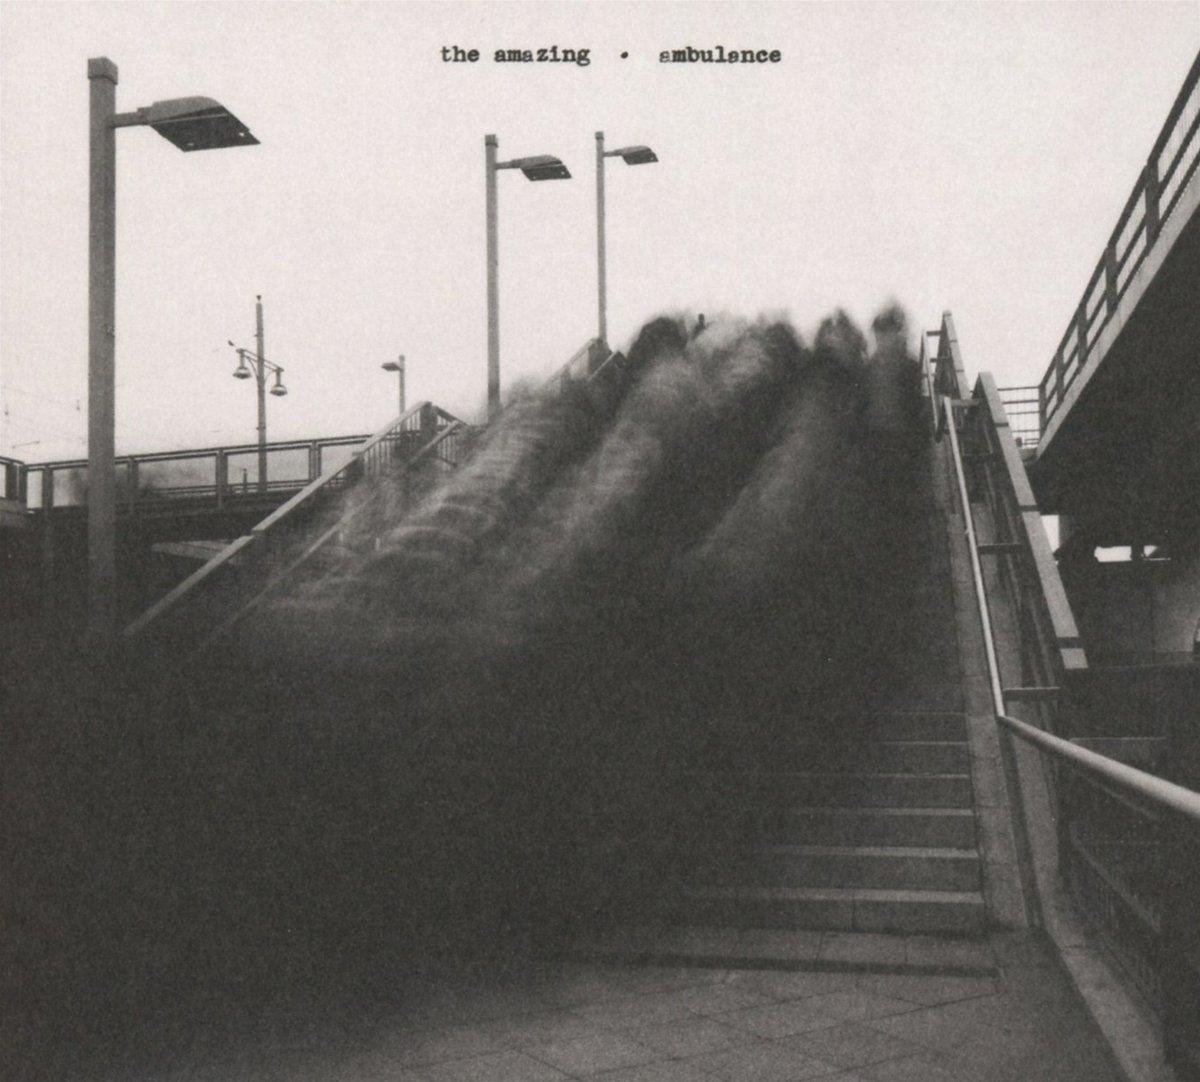 The Amazing – Ambulance (Partisan Records)